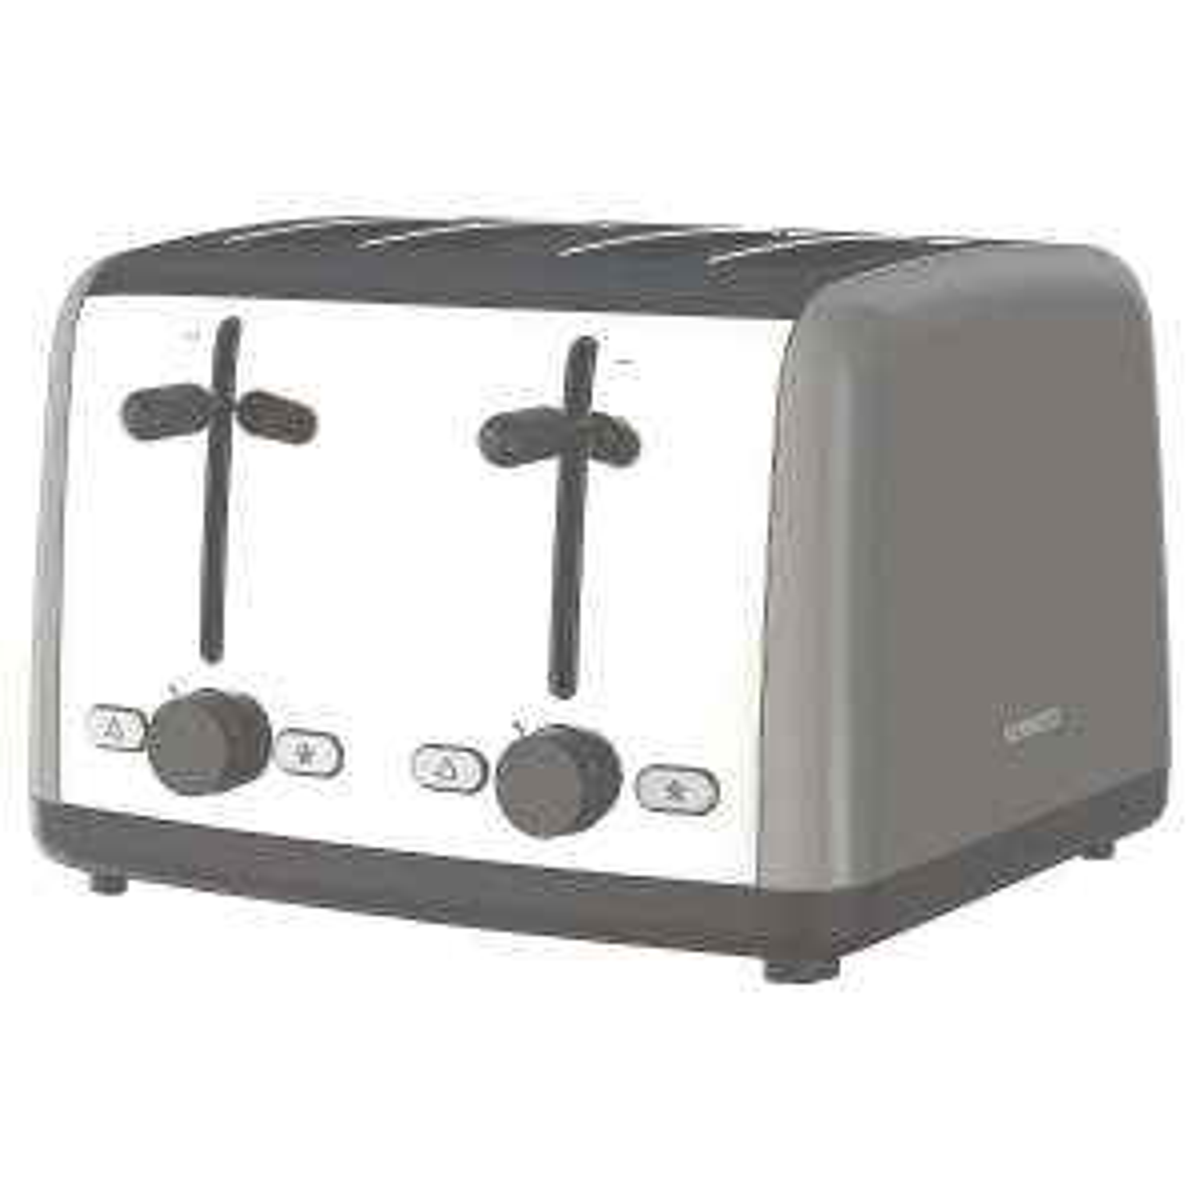 Kenwood Scene 4 Slice Toaster - 1800w Grey Half Price £20 @ Tesco Outlet Ebay